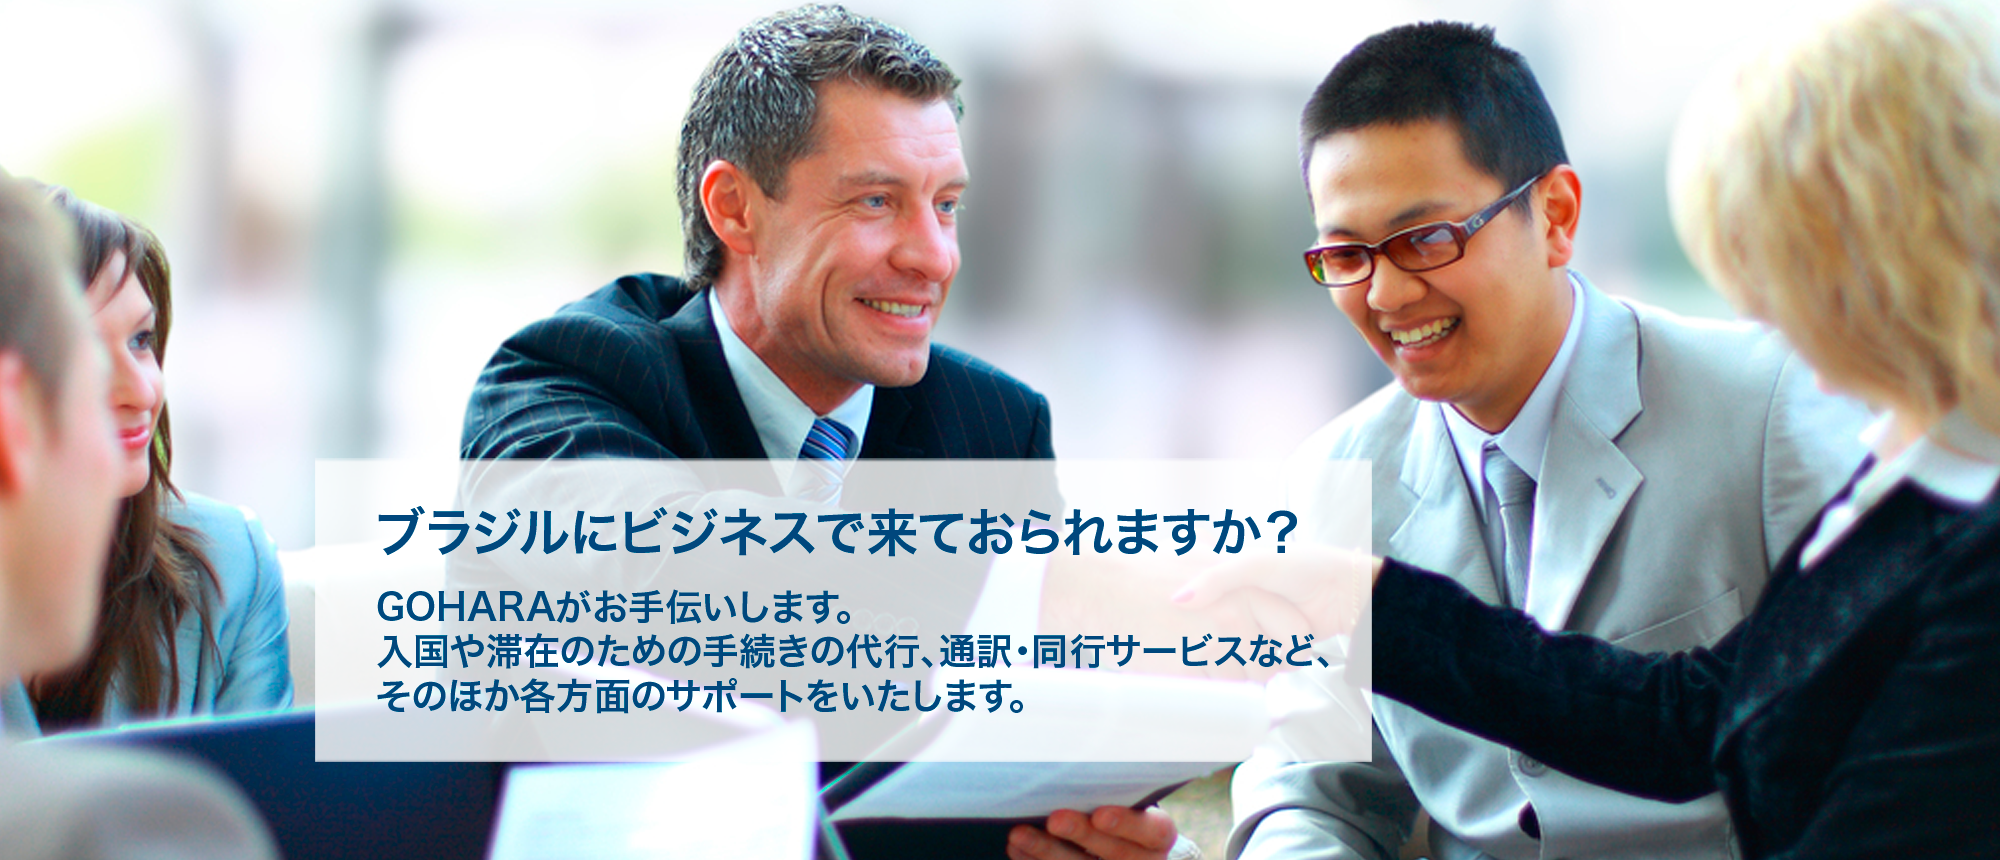 gohara-banner1_JP